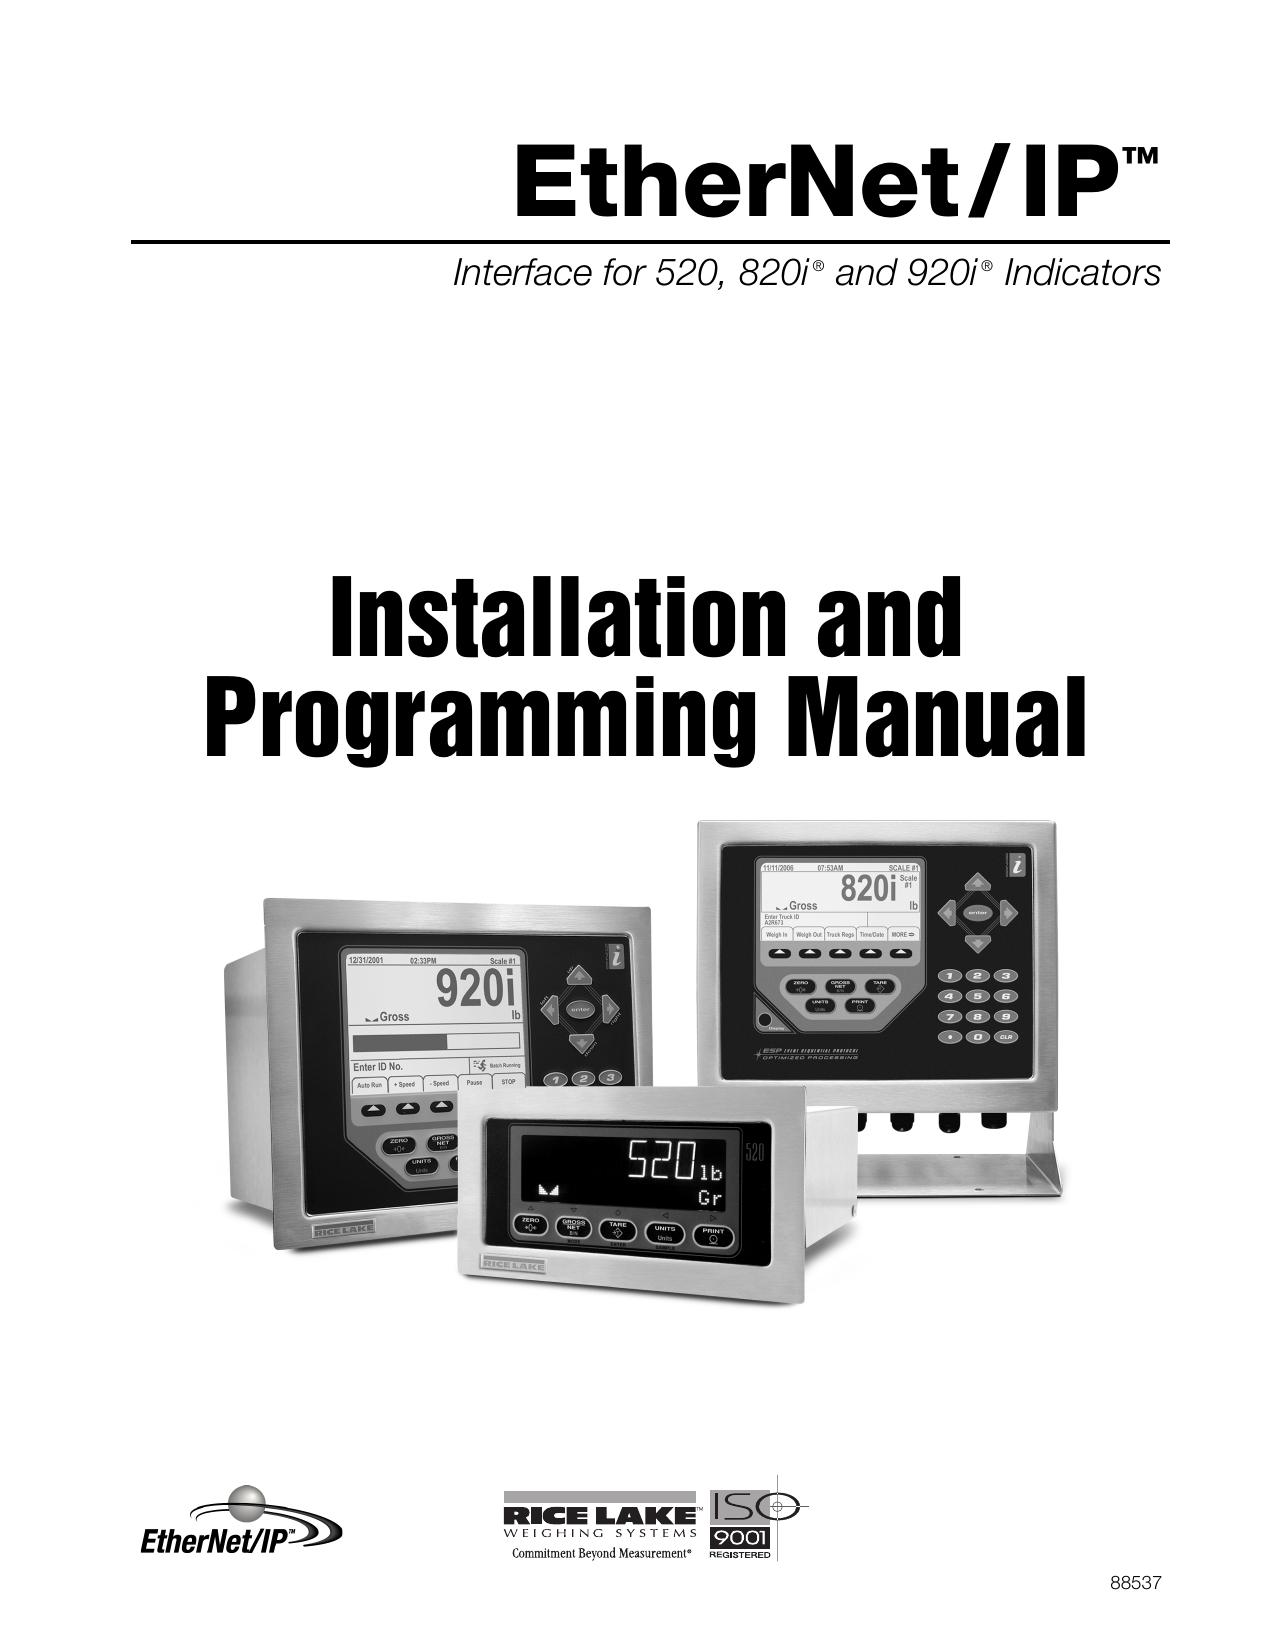 EtherNet/IP™ Installation and Programming Manual | manualzz com